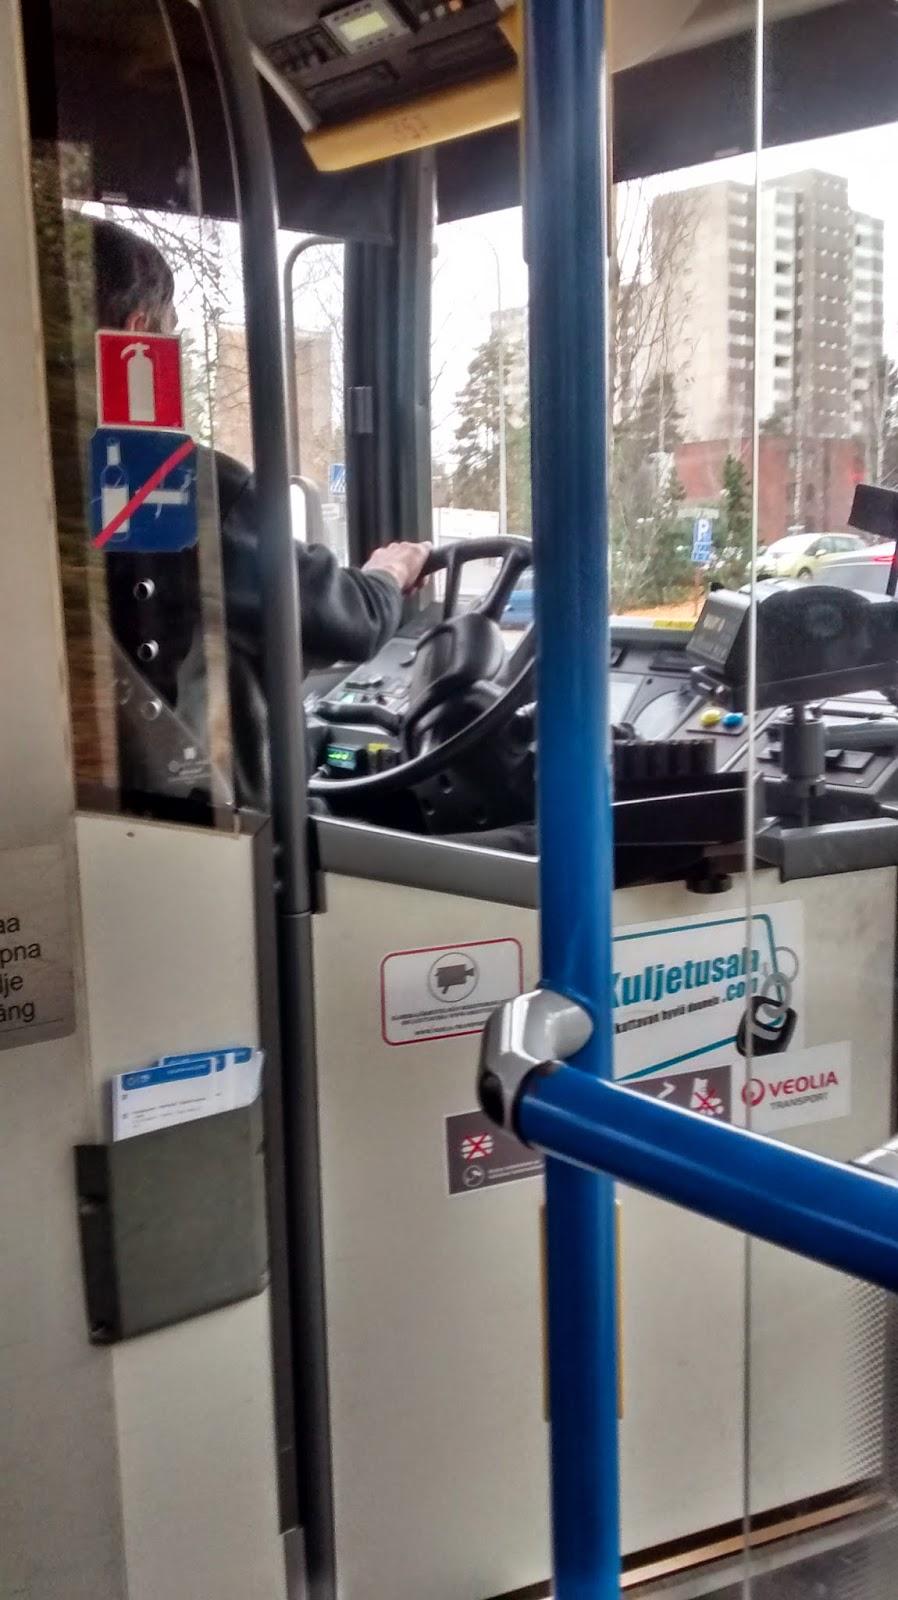 Sistema de transporte na Finlândia